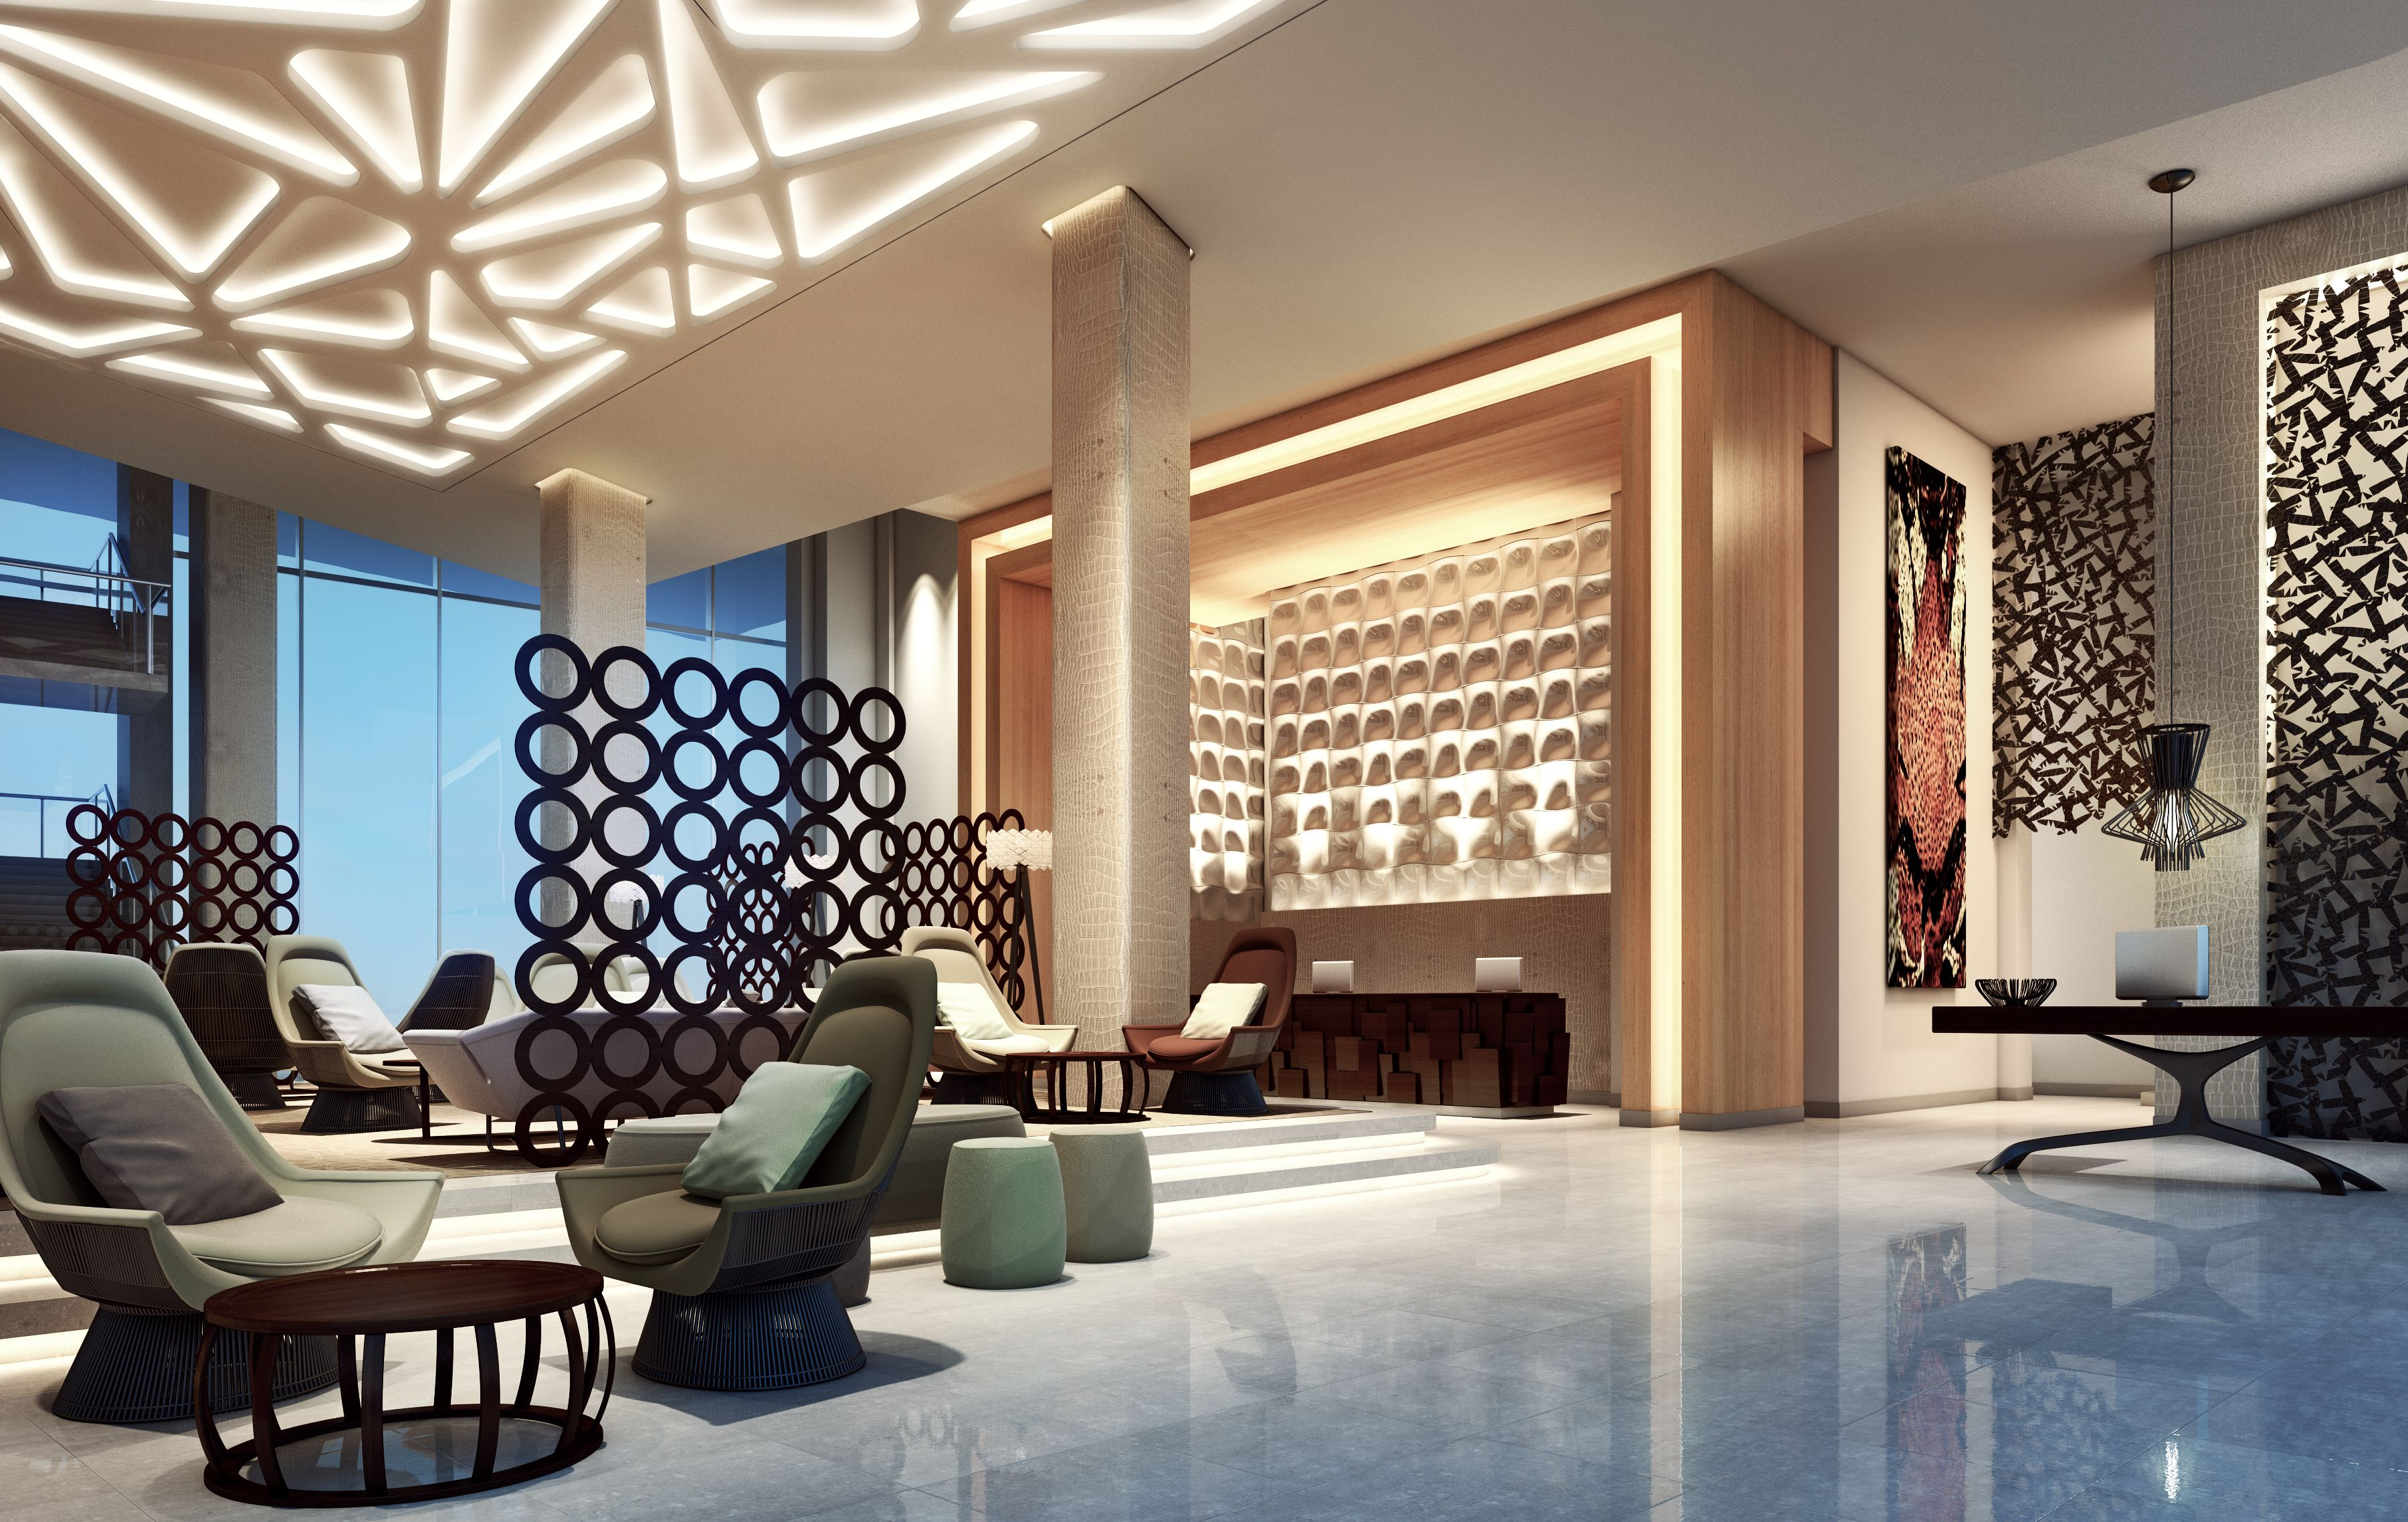 Phil Darby Interior Design Jobs Residential Interior Design